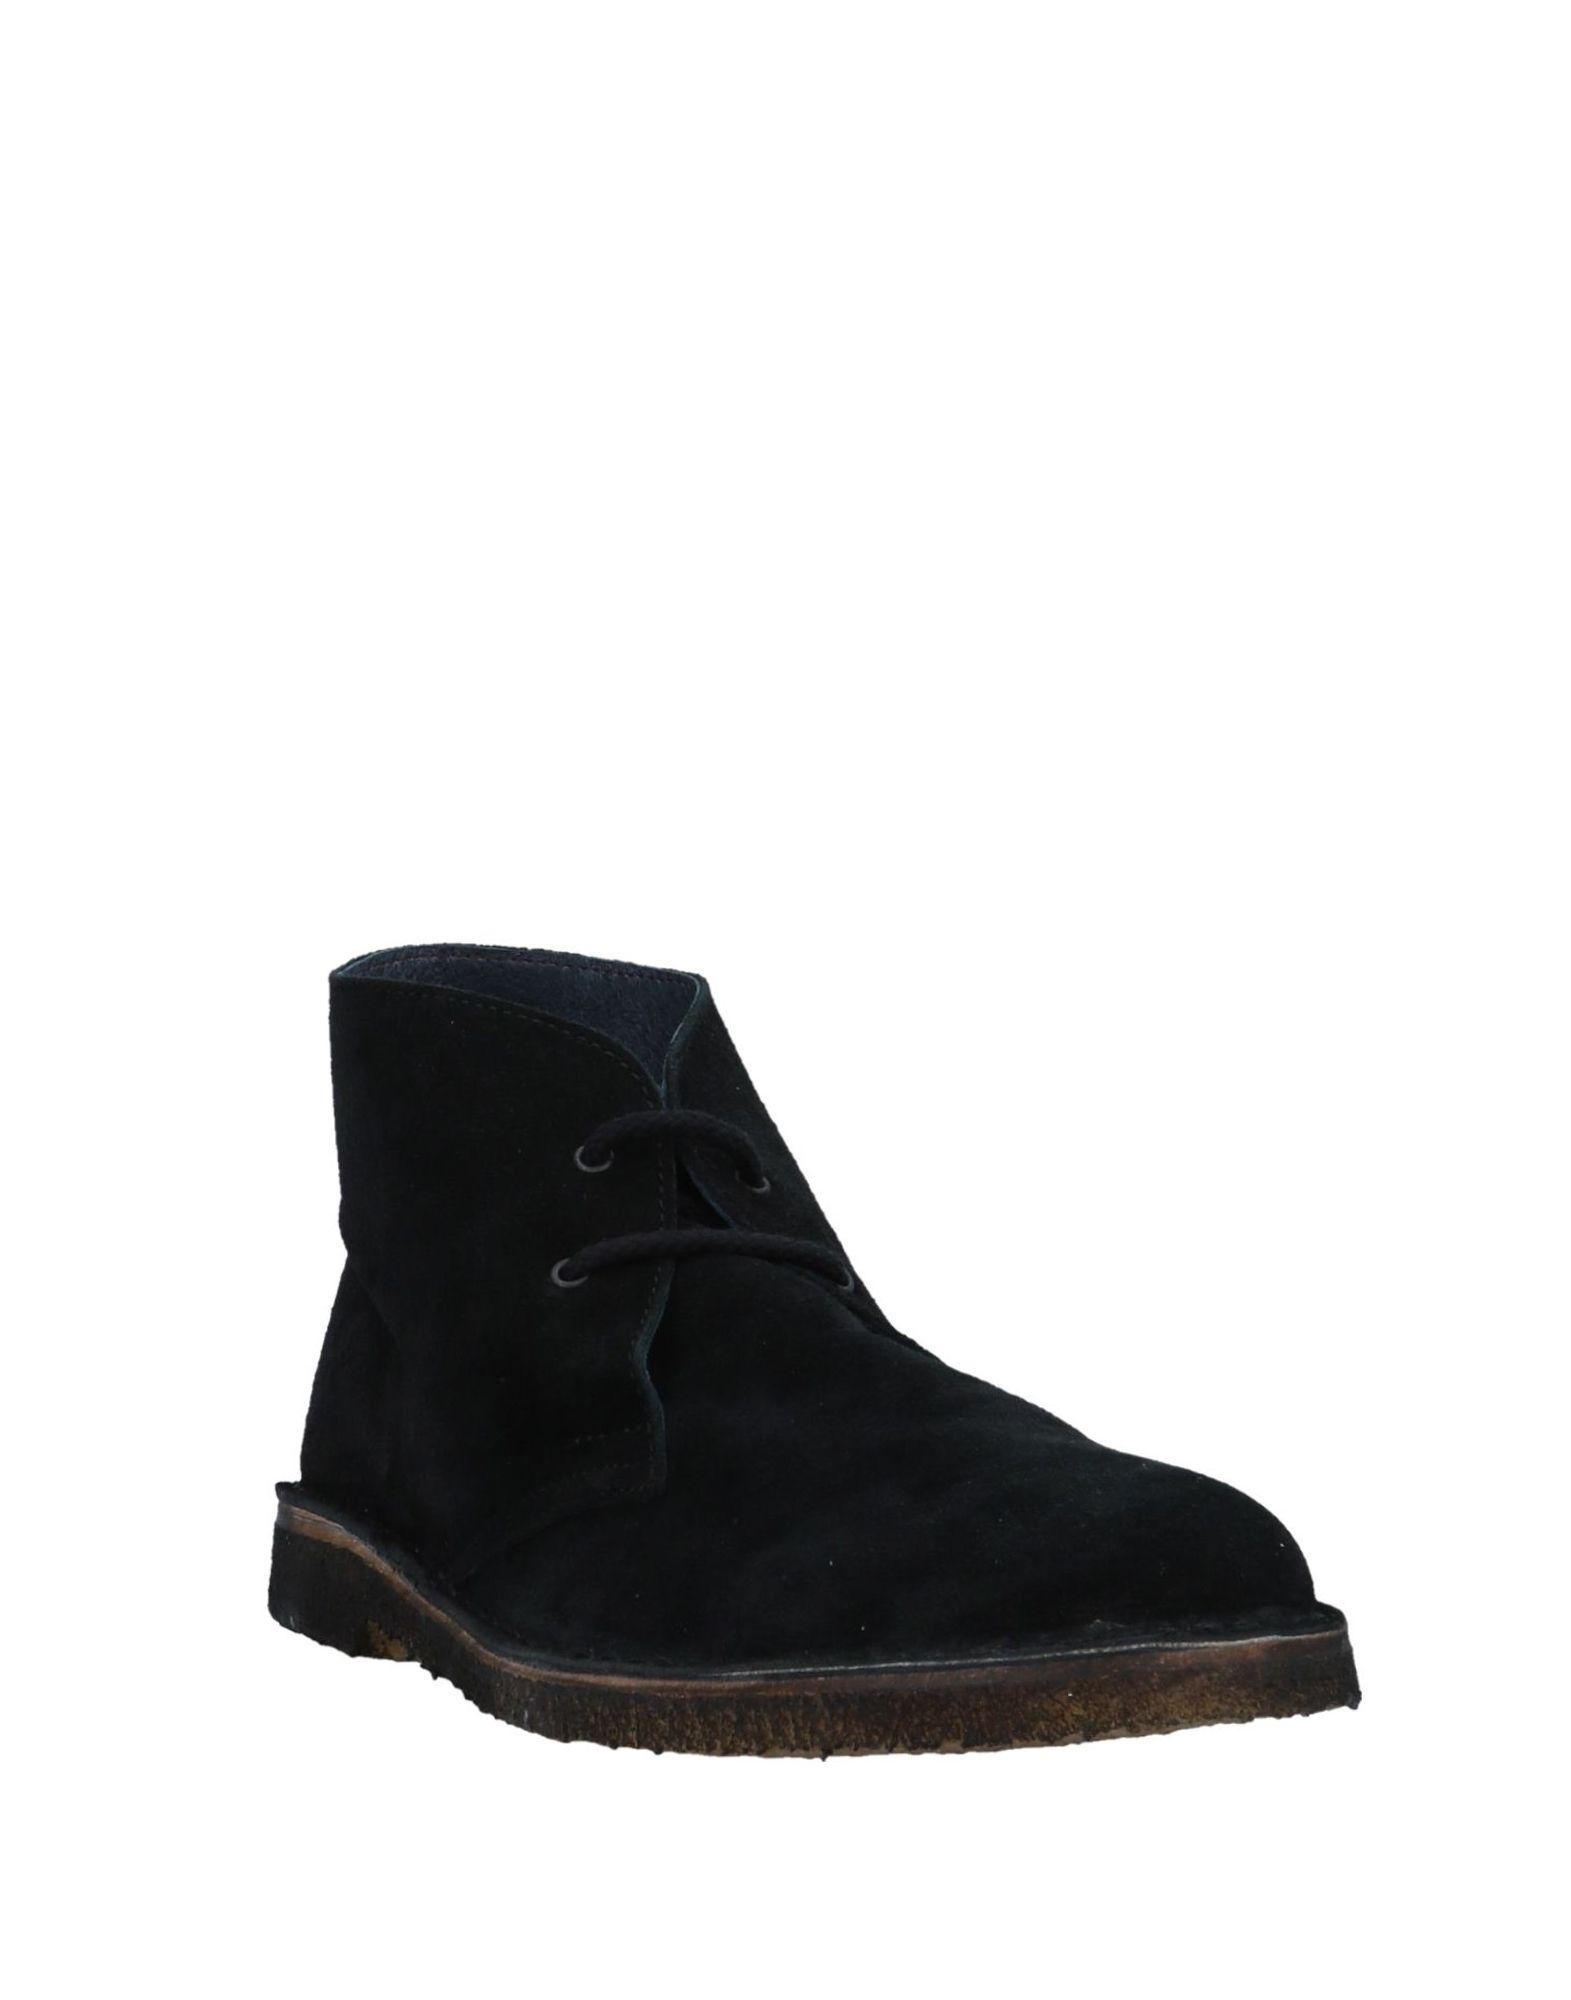 Rabatt echte Schuhe 11560783WT Ar.De.Ca. Stiefelette Herren  11560783WT Schuhe 5bc245